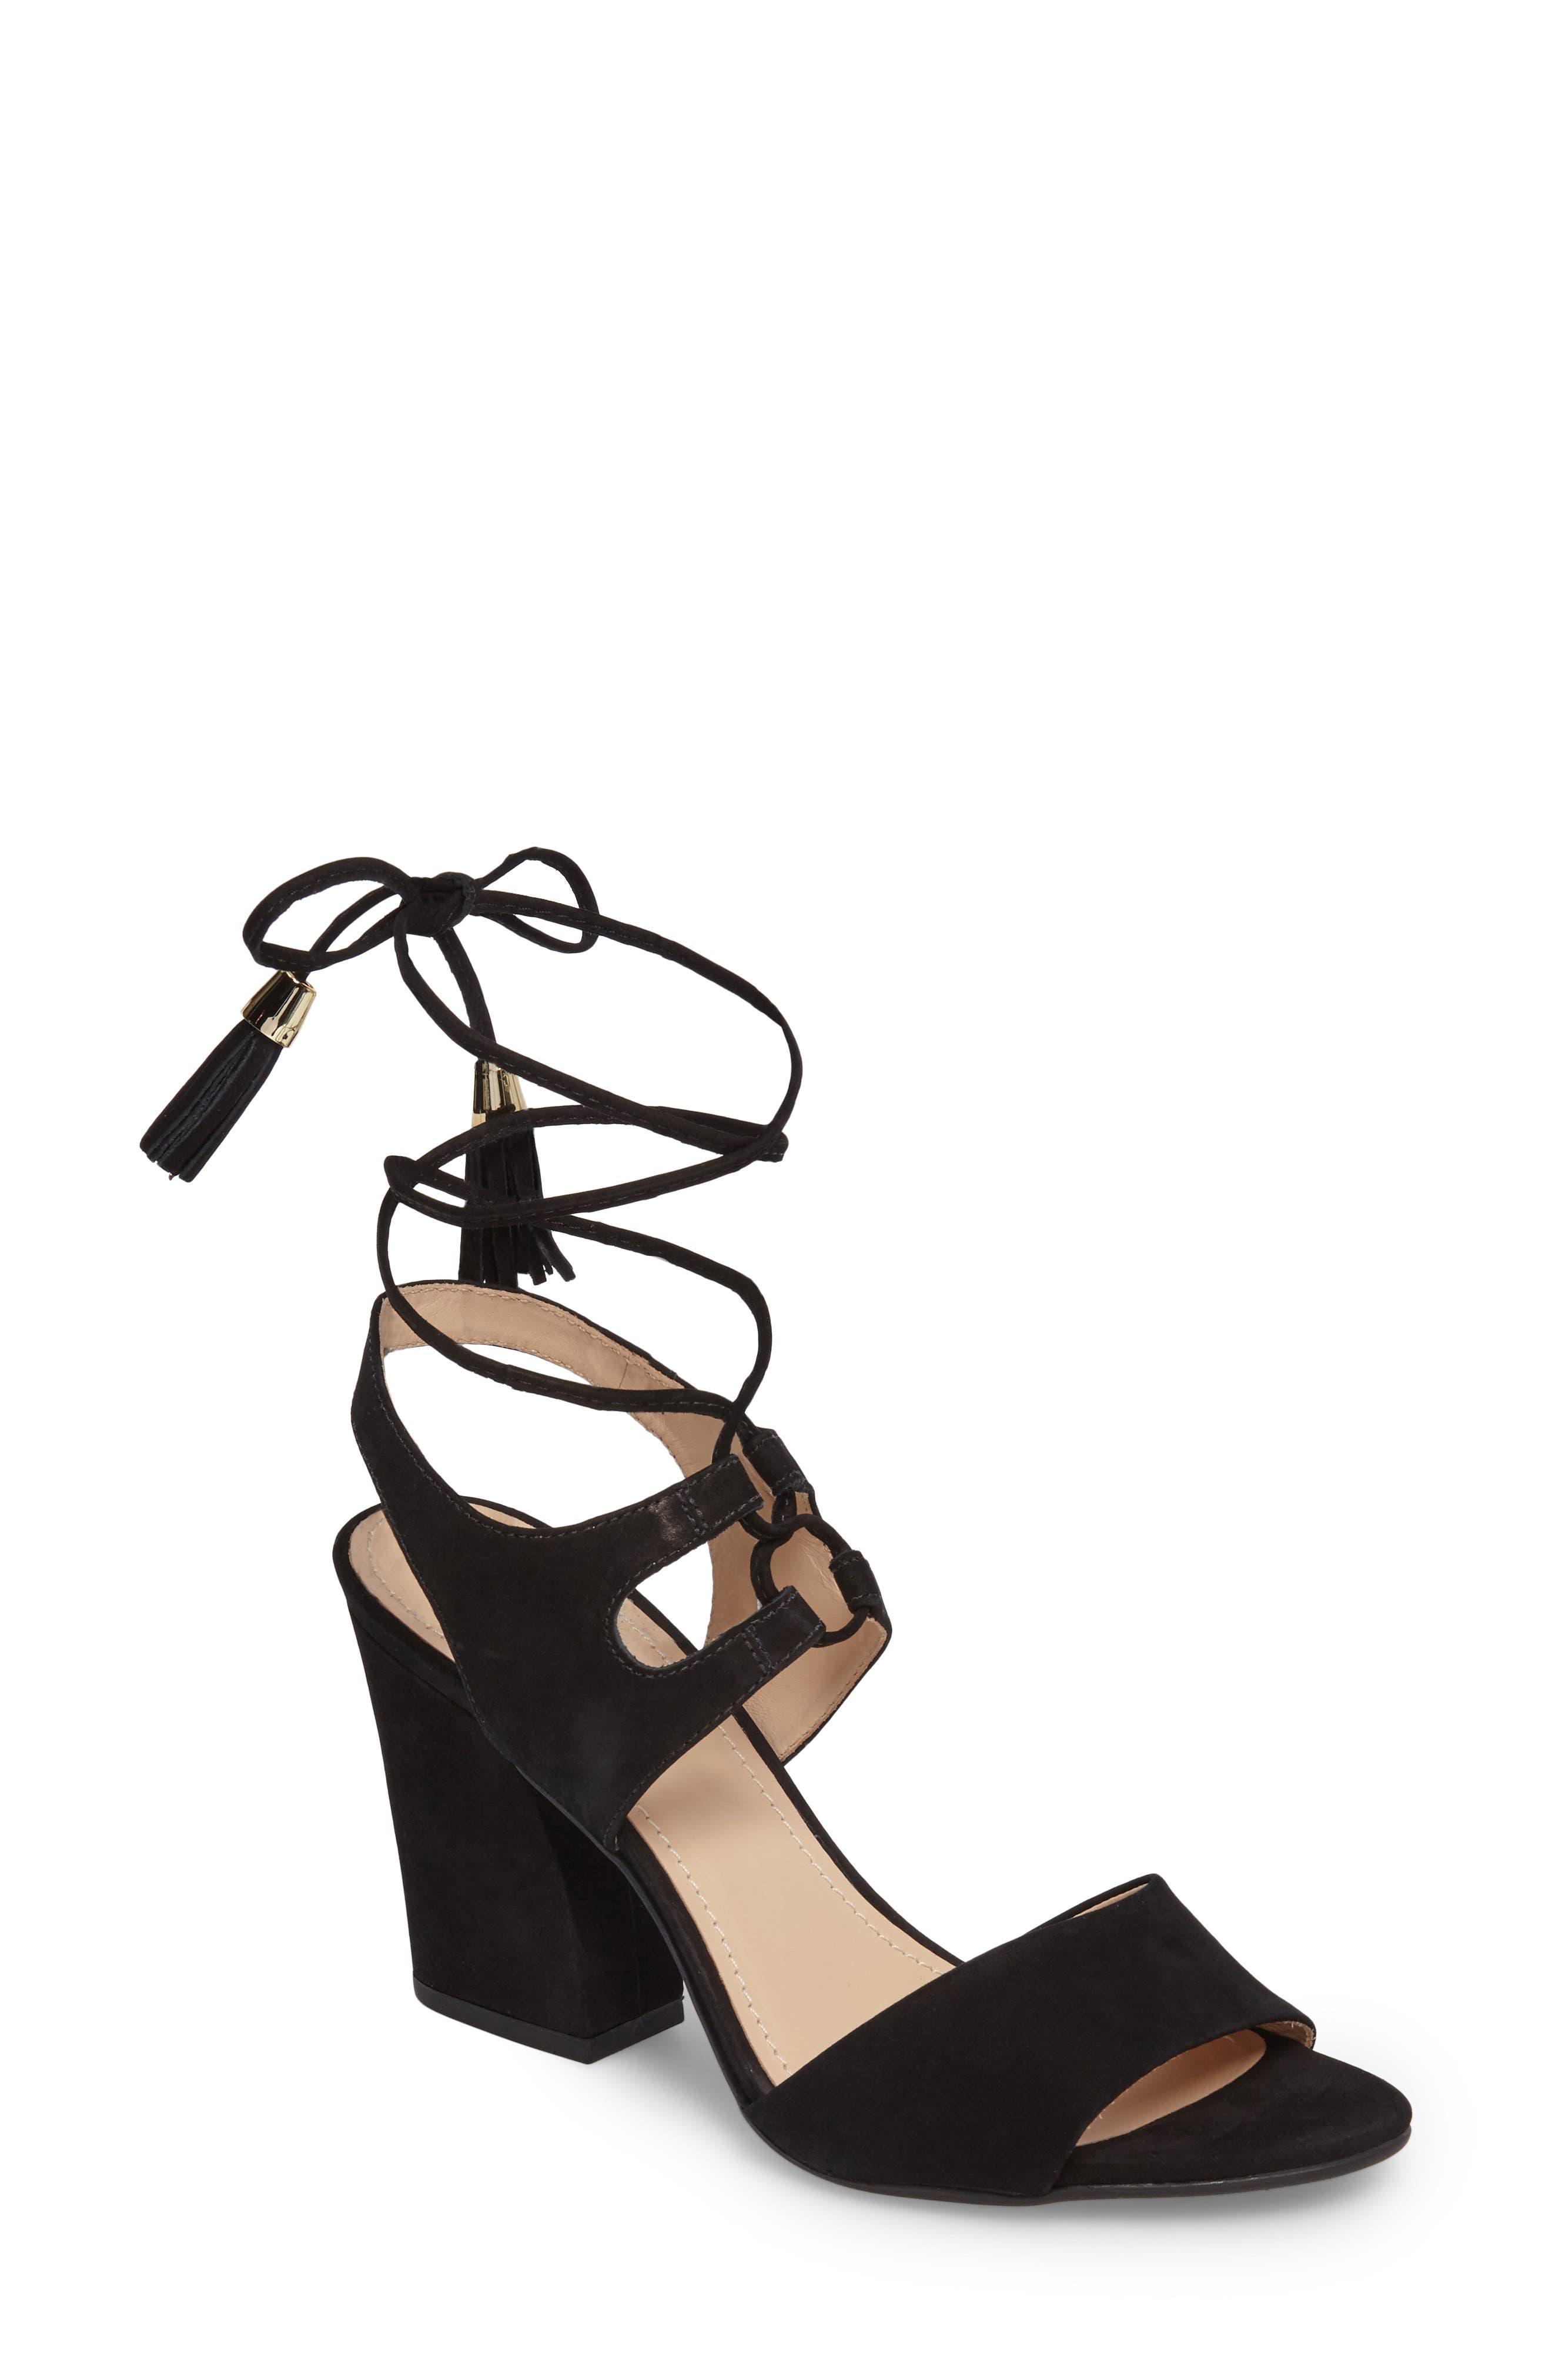 Kaira Ankle Wrap Sandal,                         Main,                         color, Black Nubuck Leather